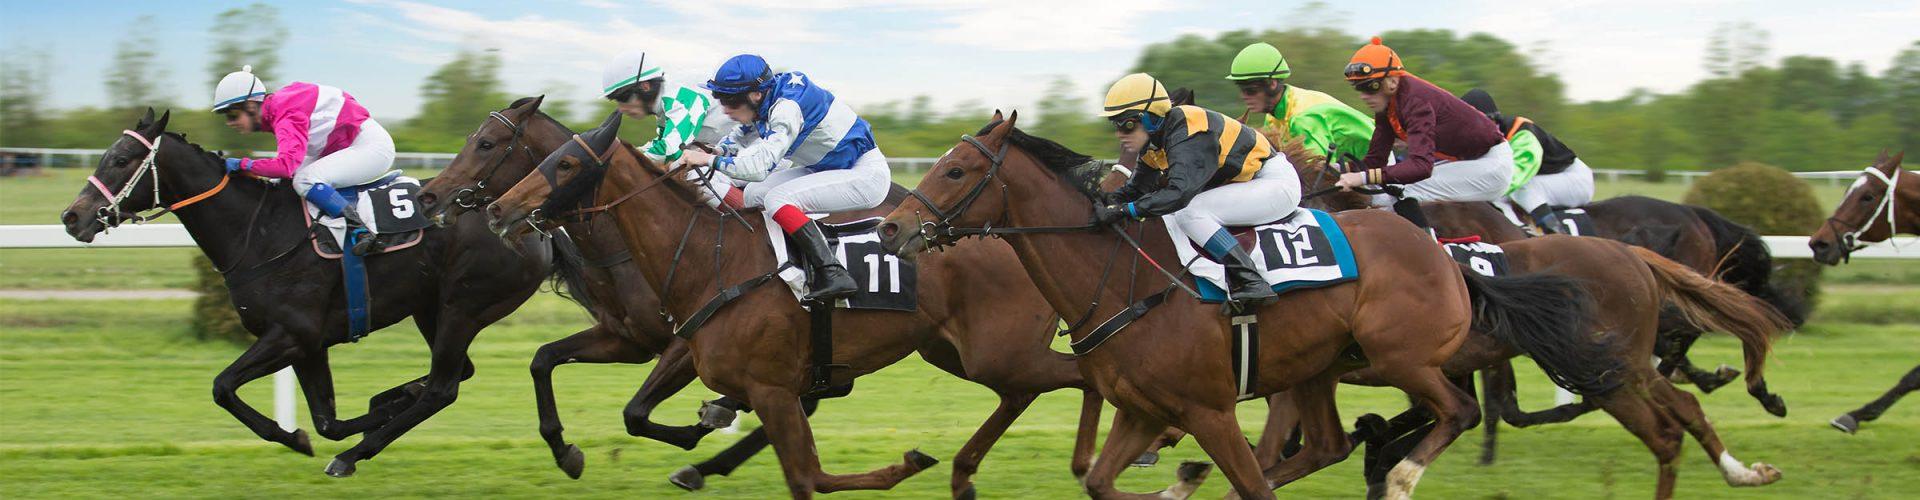 Horses horse racing with their jockeys